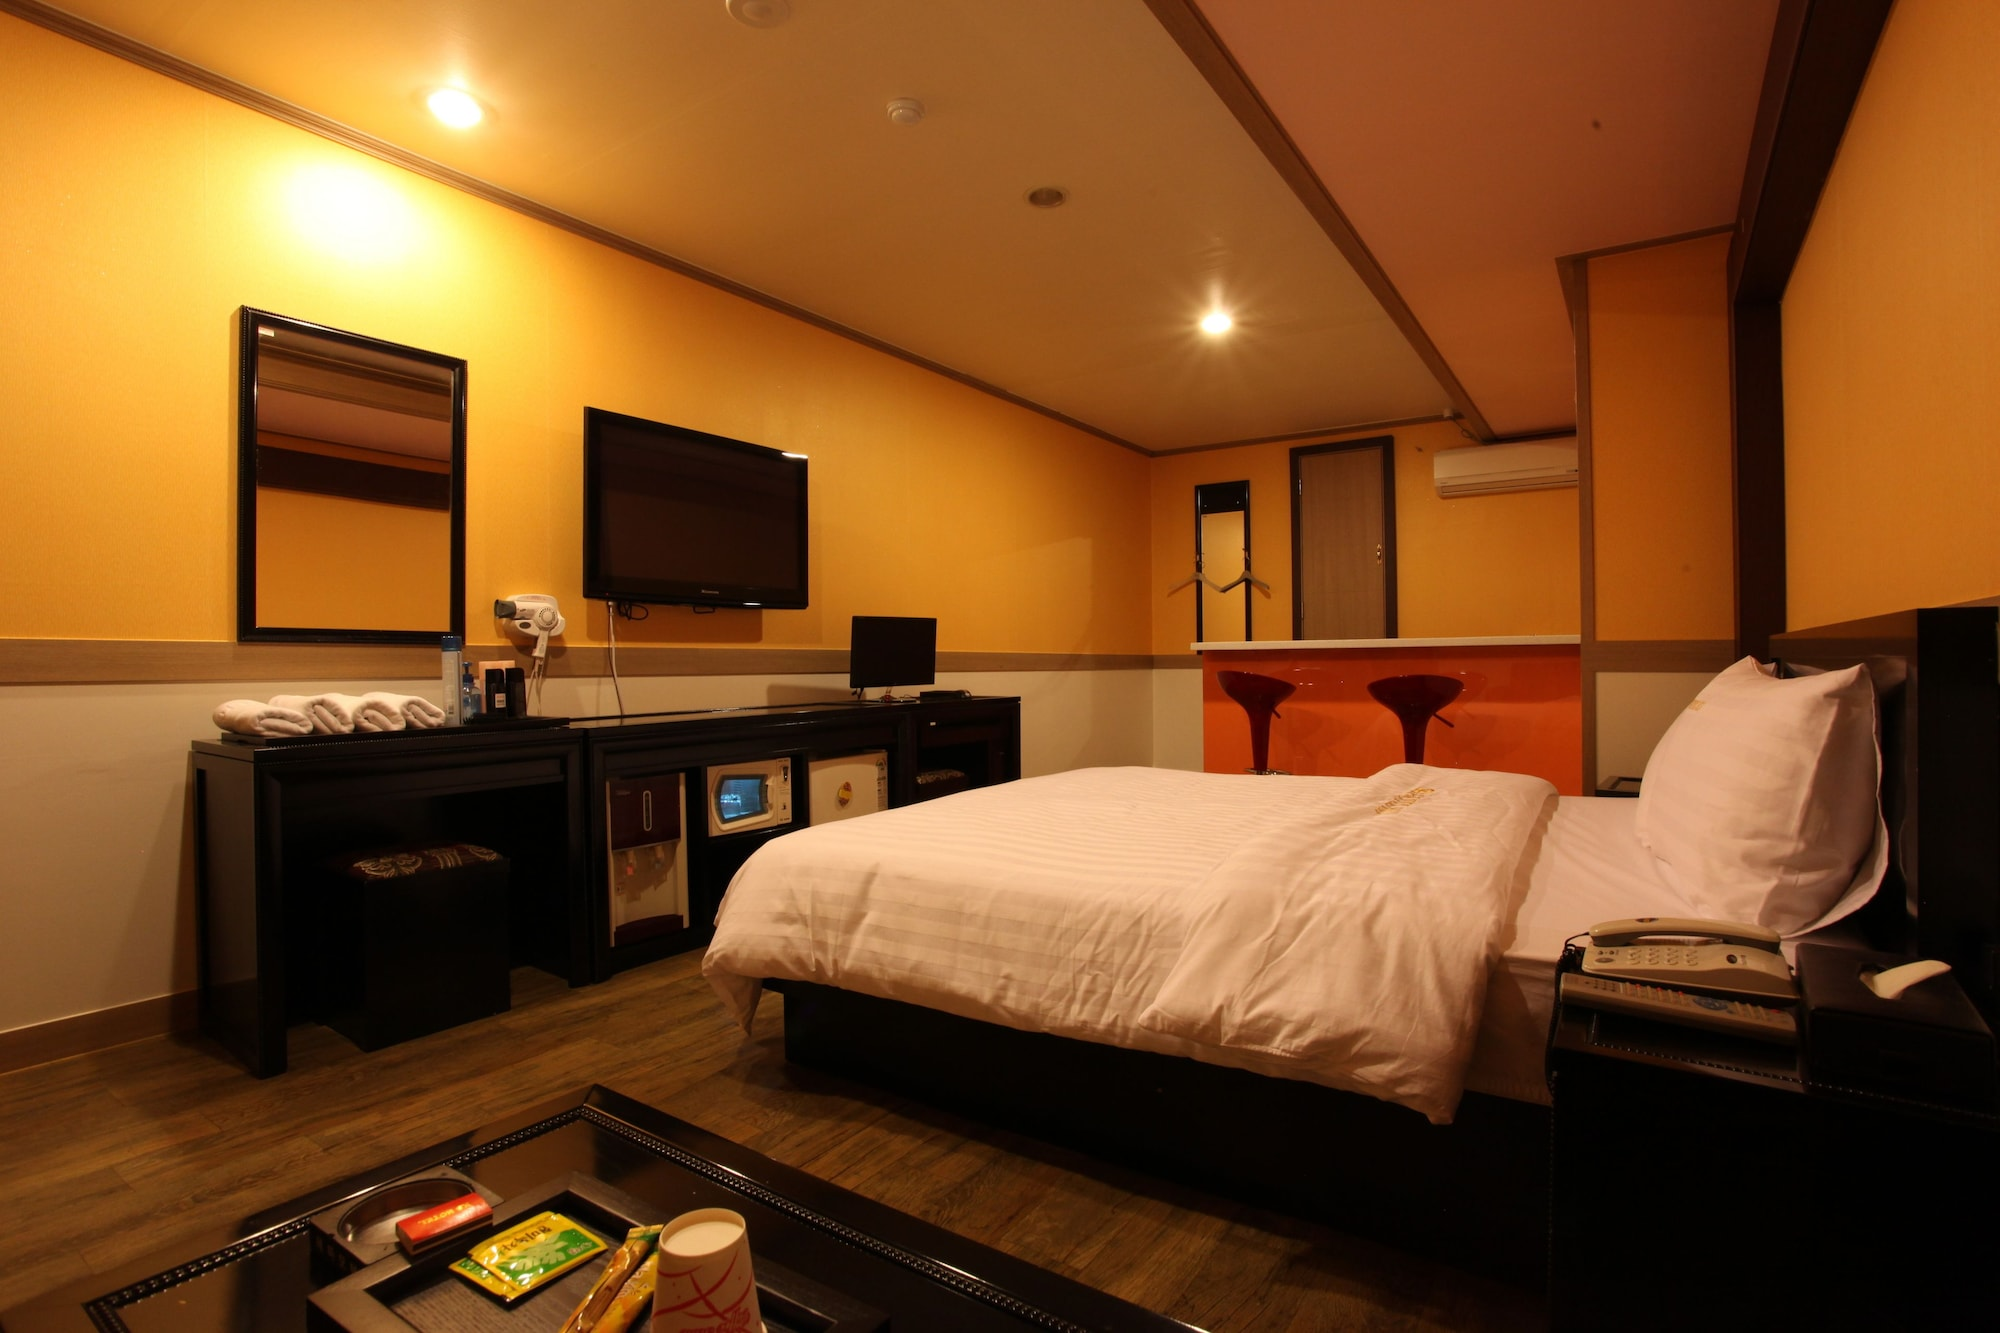 KS Hotel, Cheonan